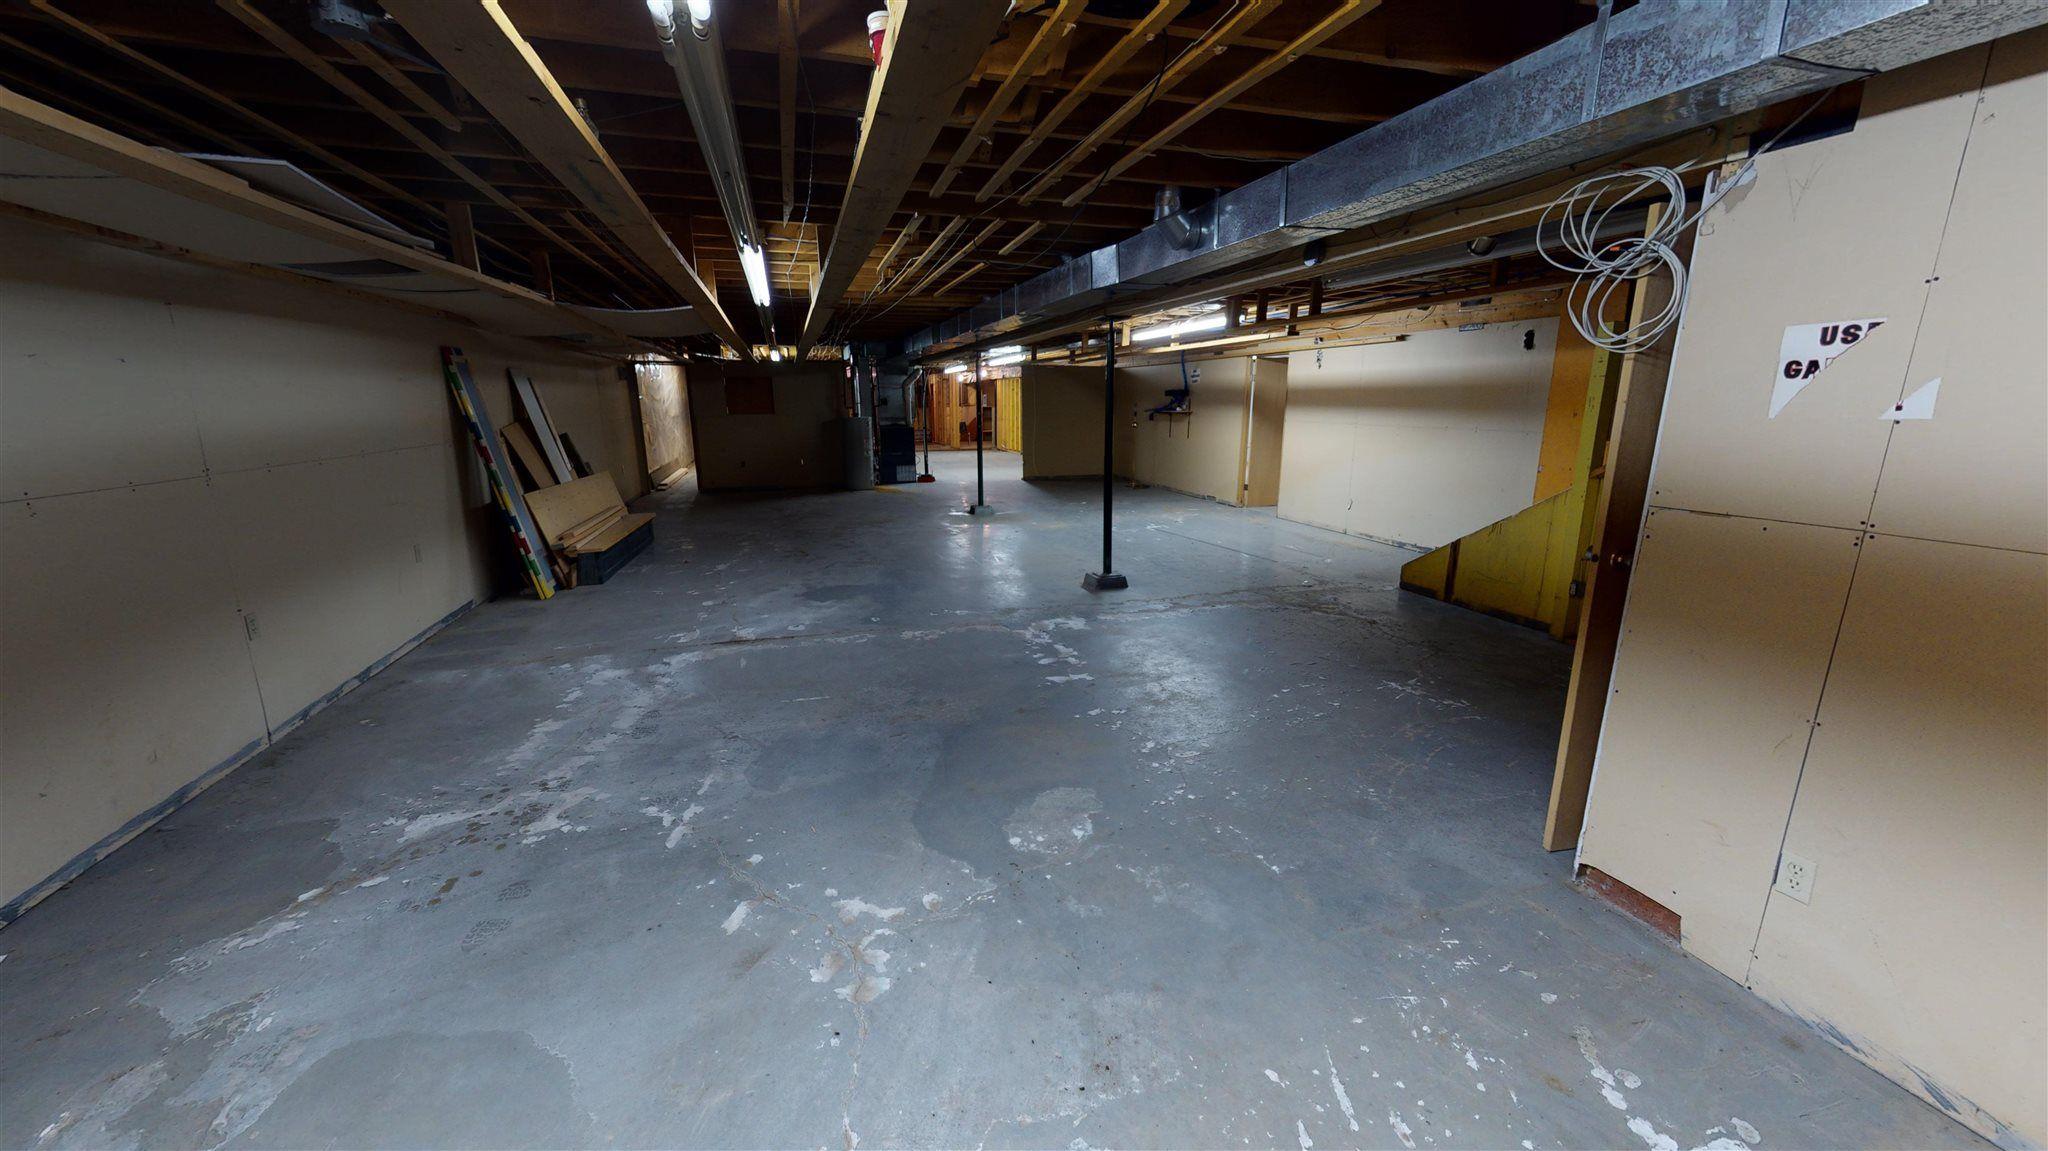 Photo 35: Photos: 10067 100 Avenue in Fort St. John: Fort St. John - City NW Office for sale (Fort St. John (Zone 60))  : MLS®# C8039097